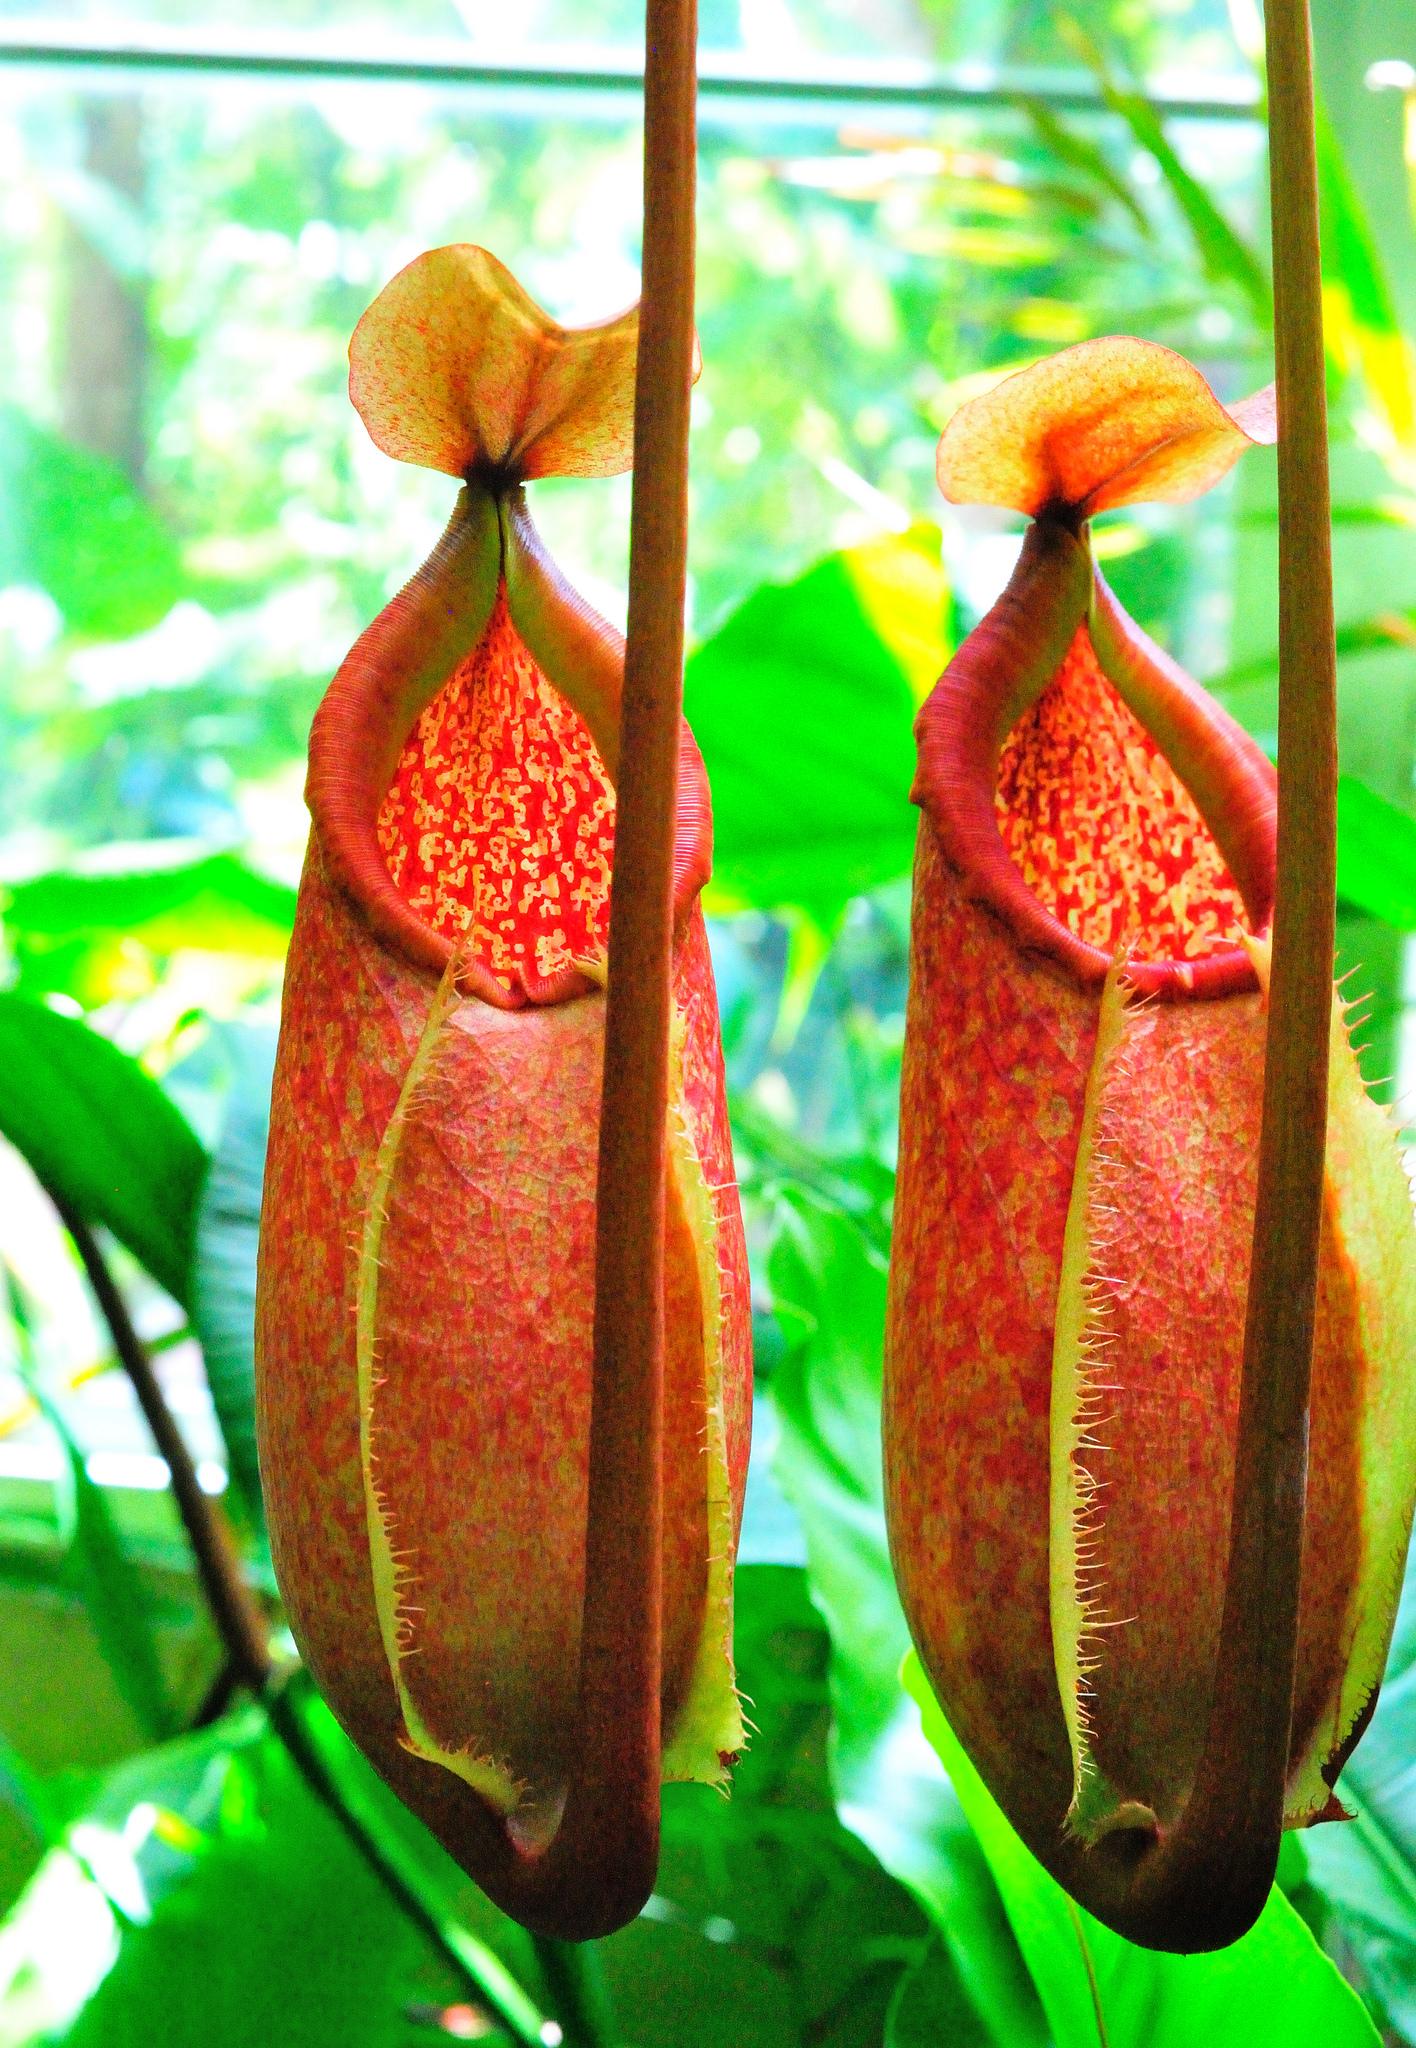 Garden Bush: Predatory Plants